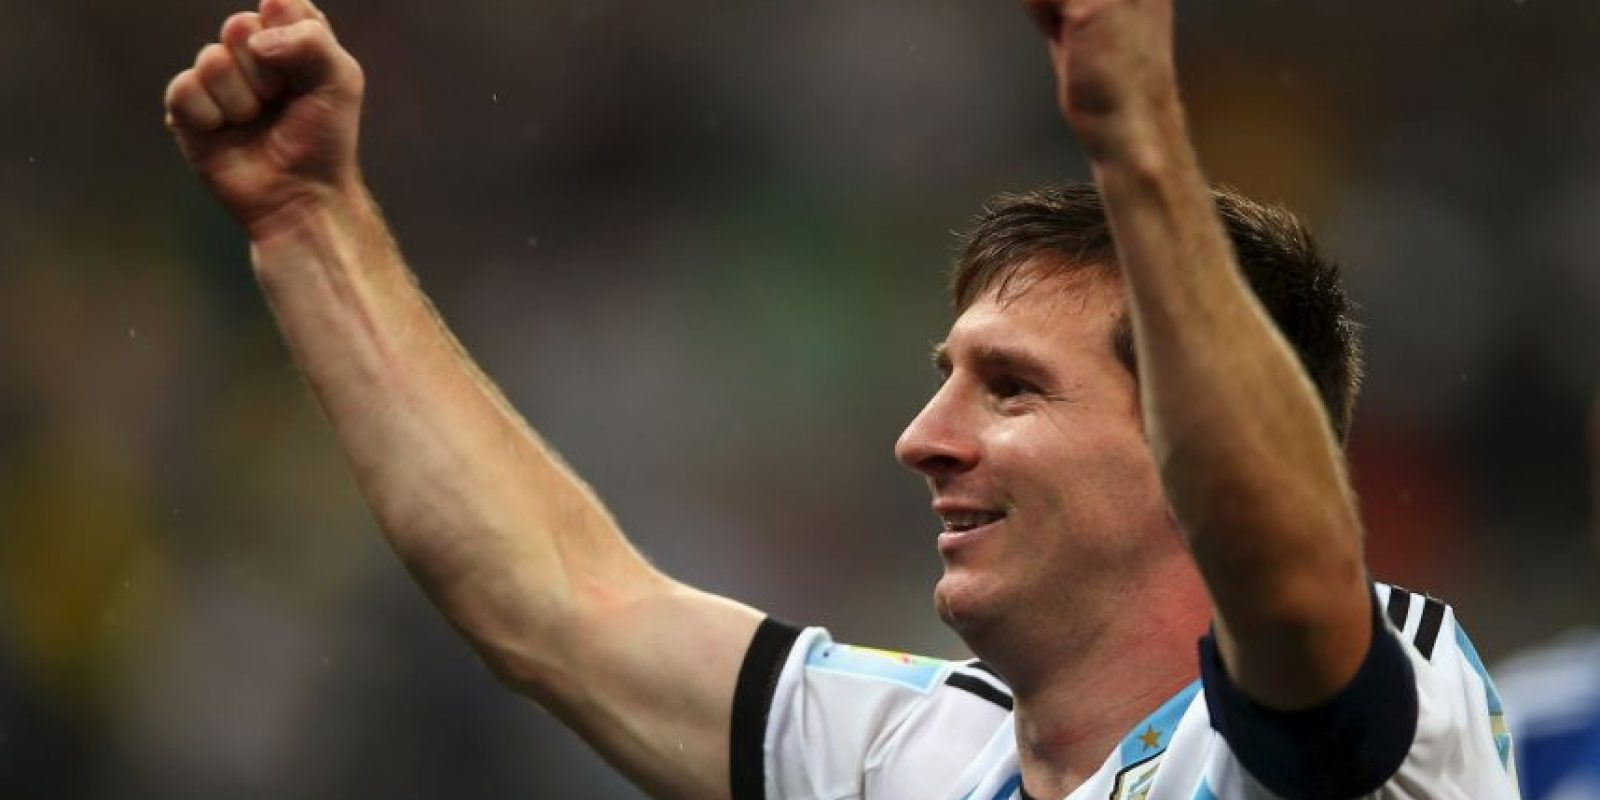 Enfrente tendrán a la Argentina que lidera Lionel Messi Foto:Getty